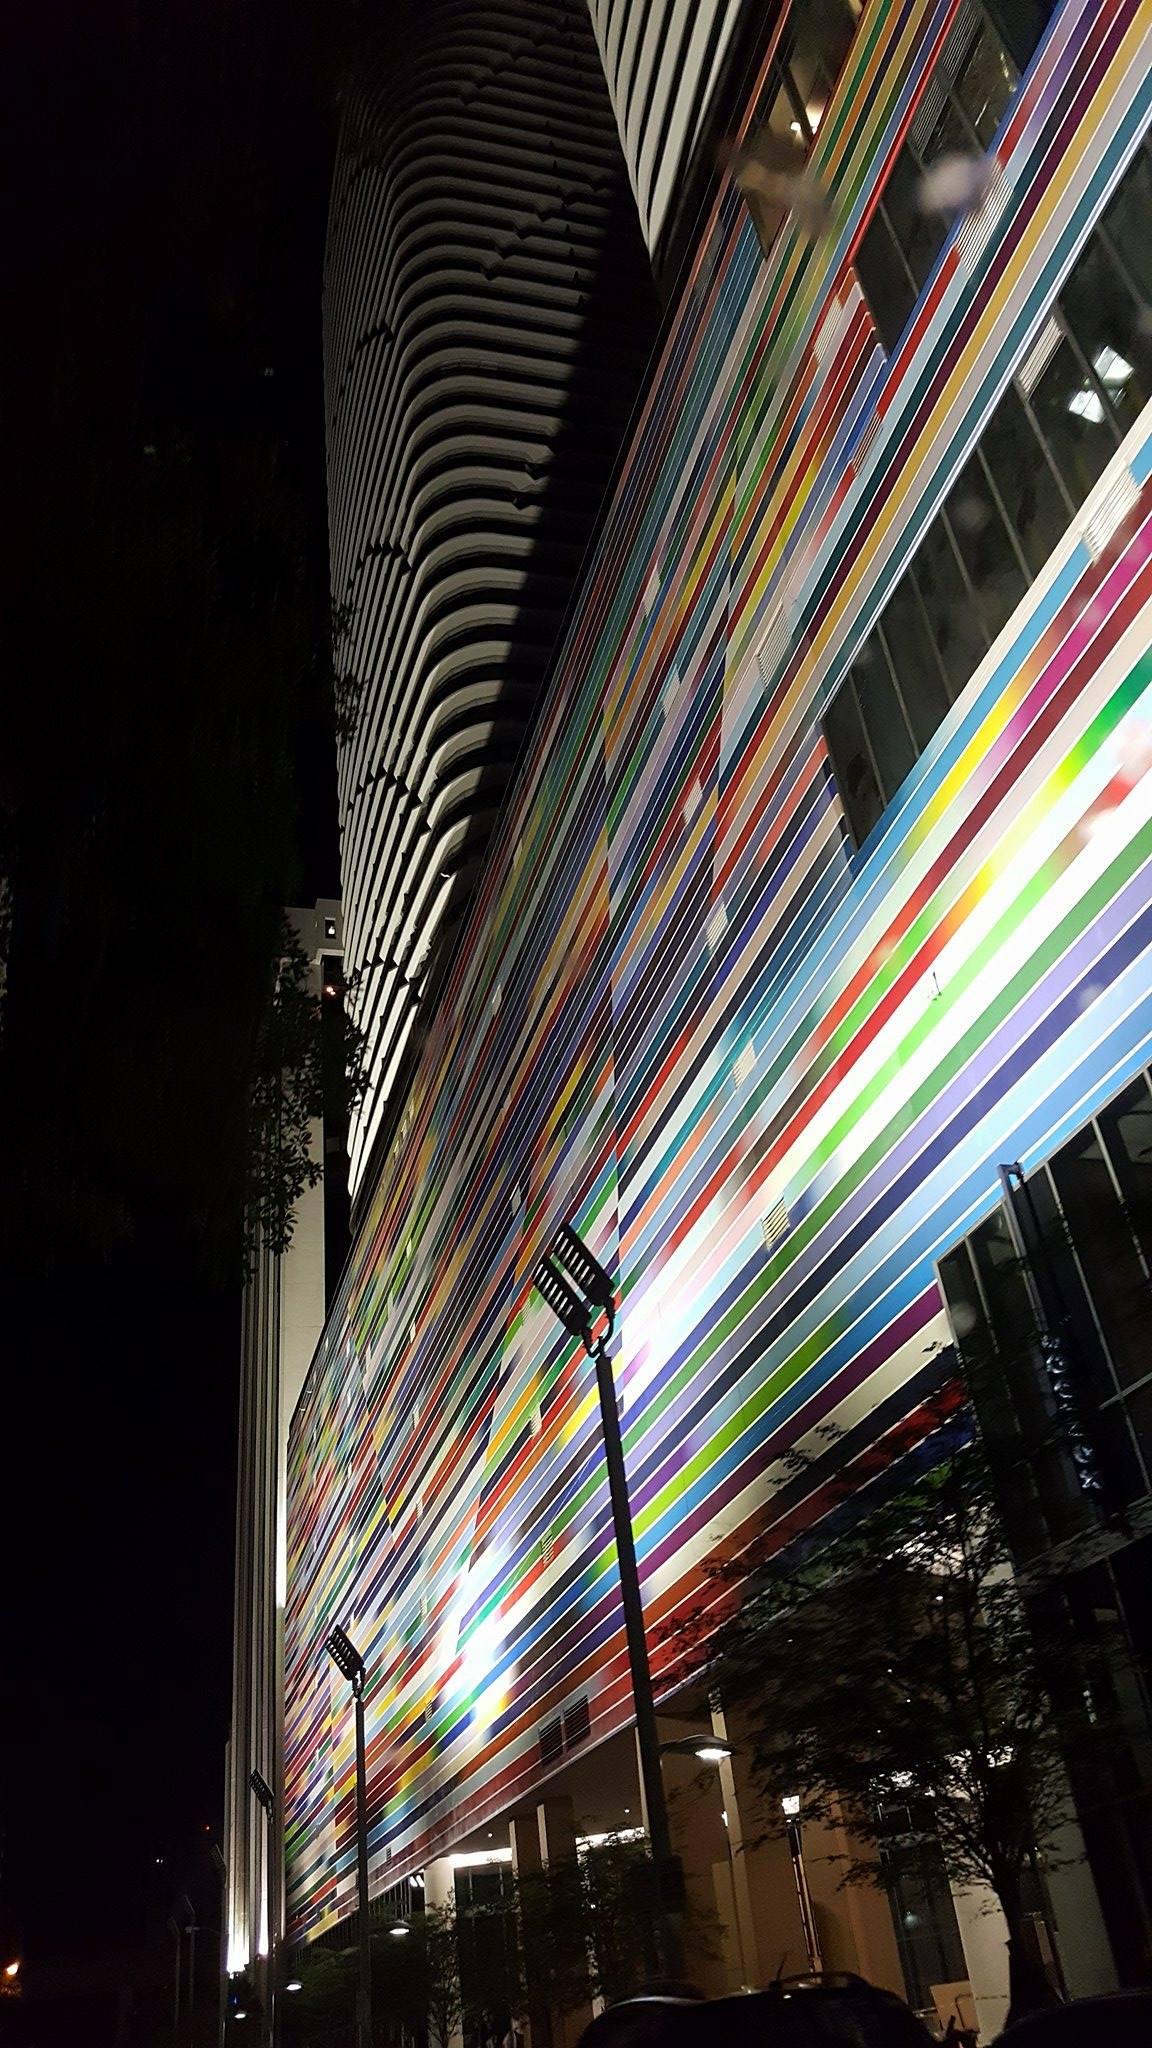 Brickell Heights Streetscape - Mural Lighting